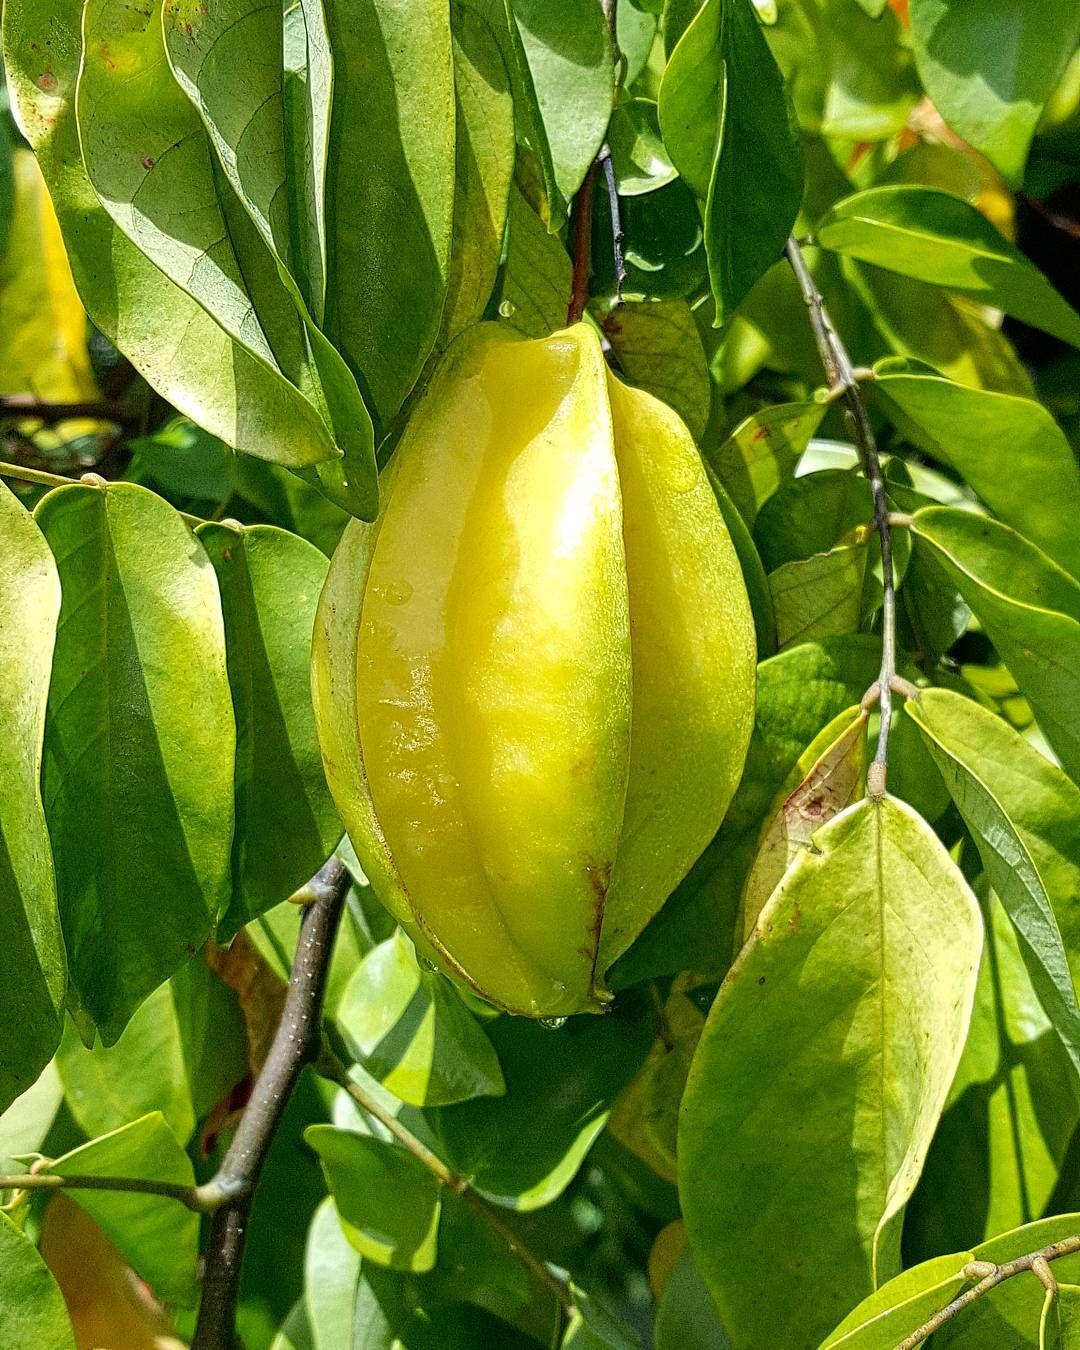 "Repost from Instagram ! #WeLike ! #Madinina by @amande_d0uce ""Carambole... Lieu: Le Lamentin | Photo: Samsung Galaxy Note 5 #fruit #garden #samsungnote5 #ig_martinique #ig_caribbean #sunday #nature #matinik_pictures #igworldclub #phototag_it #shotaward #westindies #martinique #caribbean #picoftheday #westindies #madinina #ocarribeano #all_shots #world_shotz #ig_captures #love_natura #photooftheday #worlderlust :)"" http://ift.tt/1JS40gs"